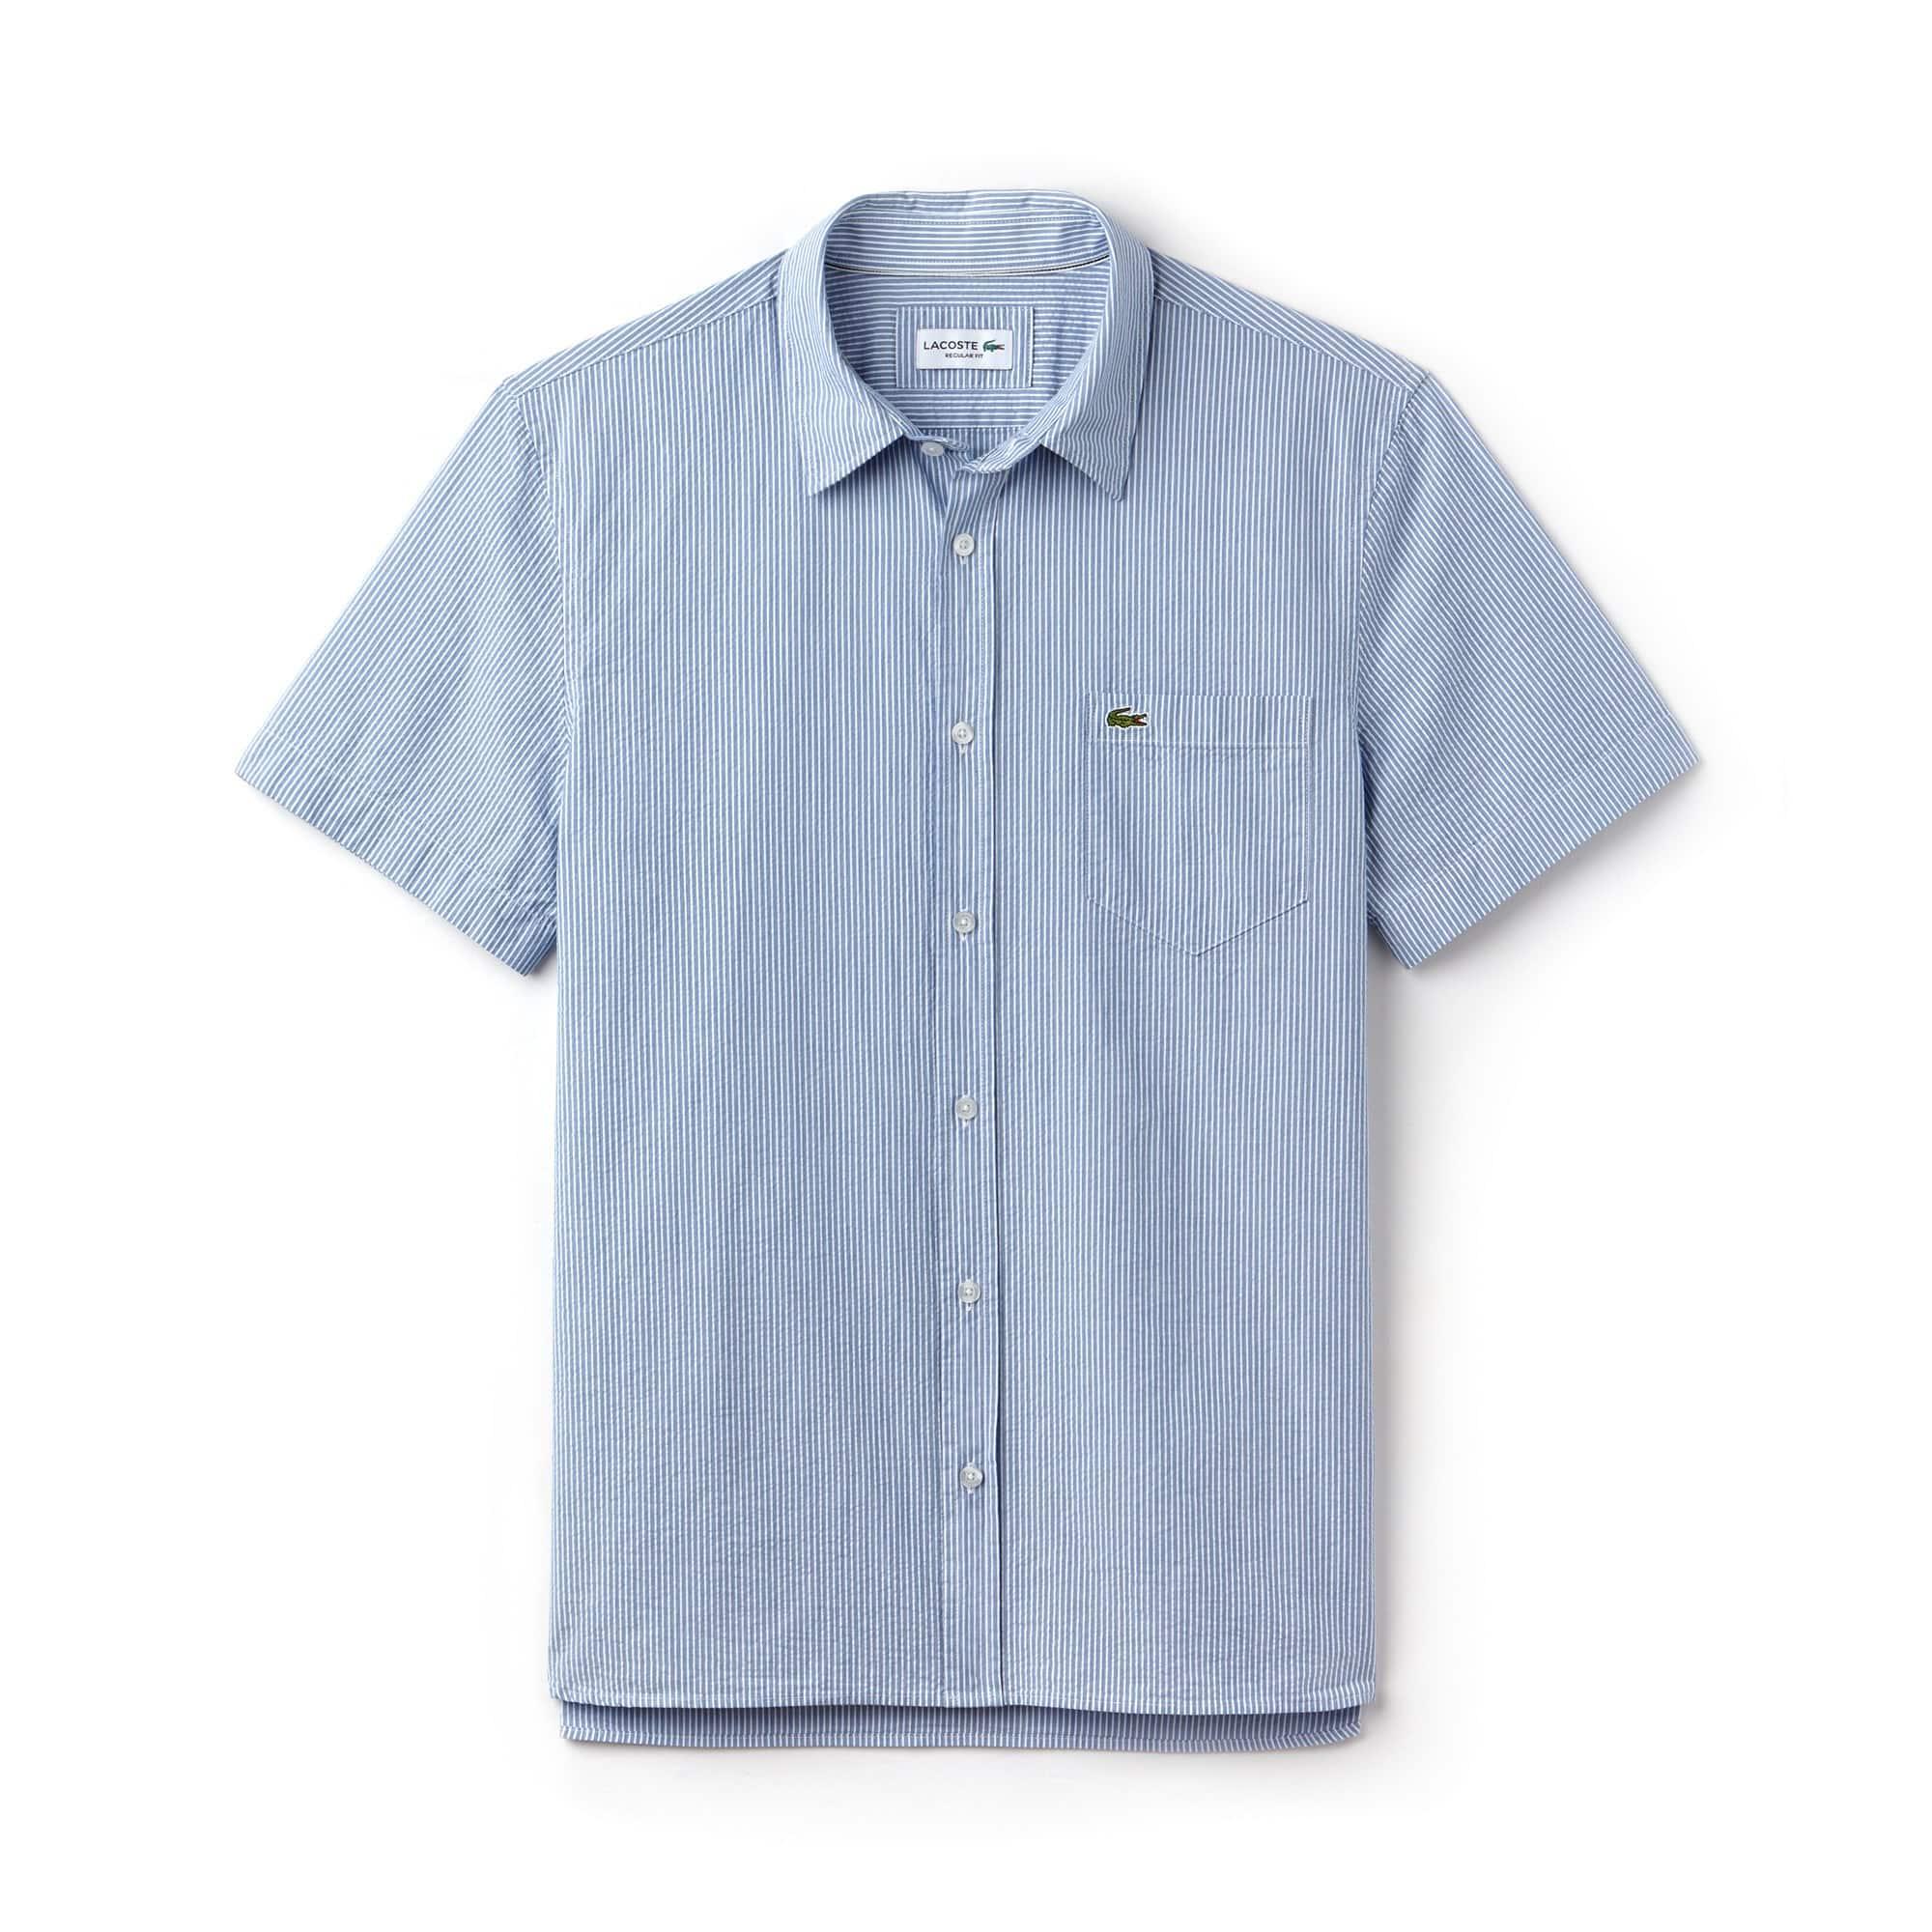 Camisa regular fit de manga corta en seersucker a rayas